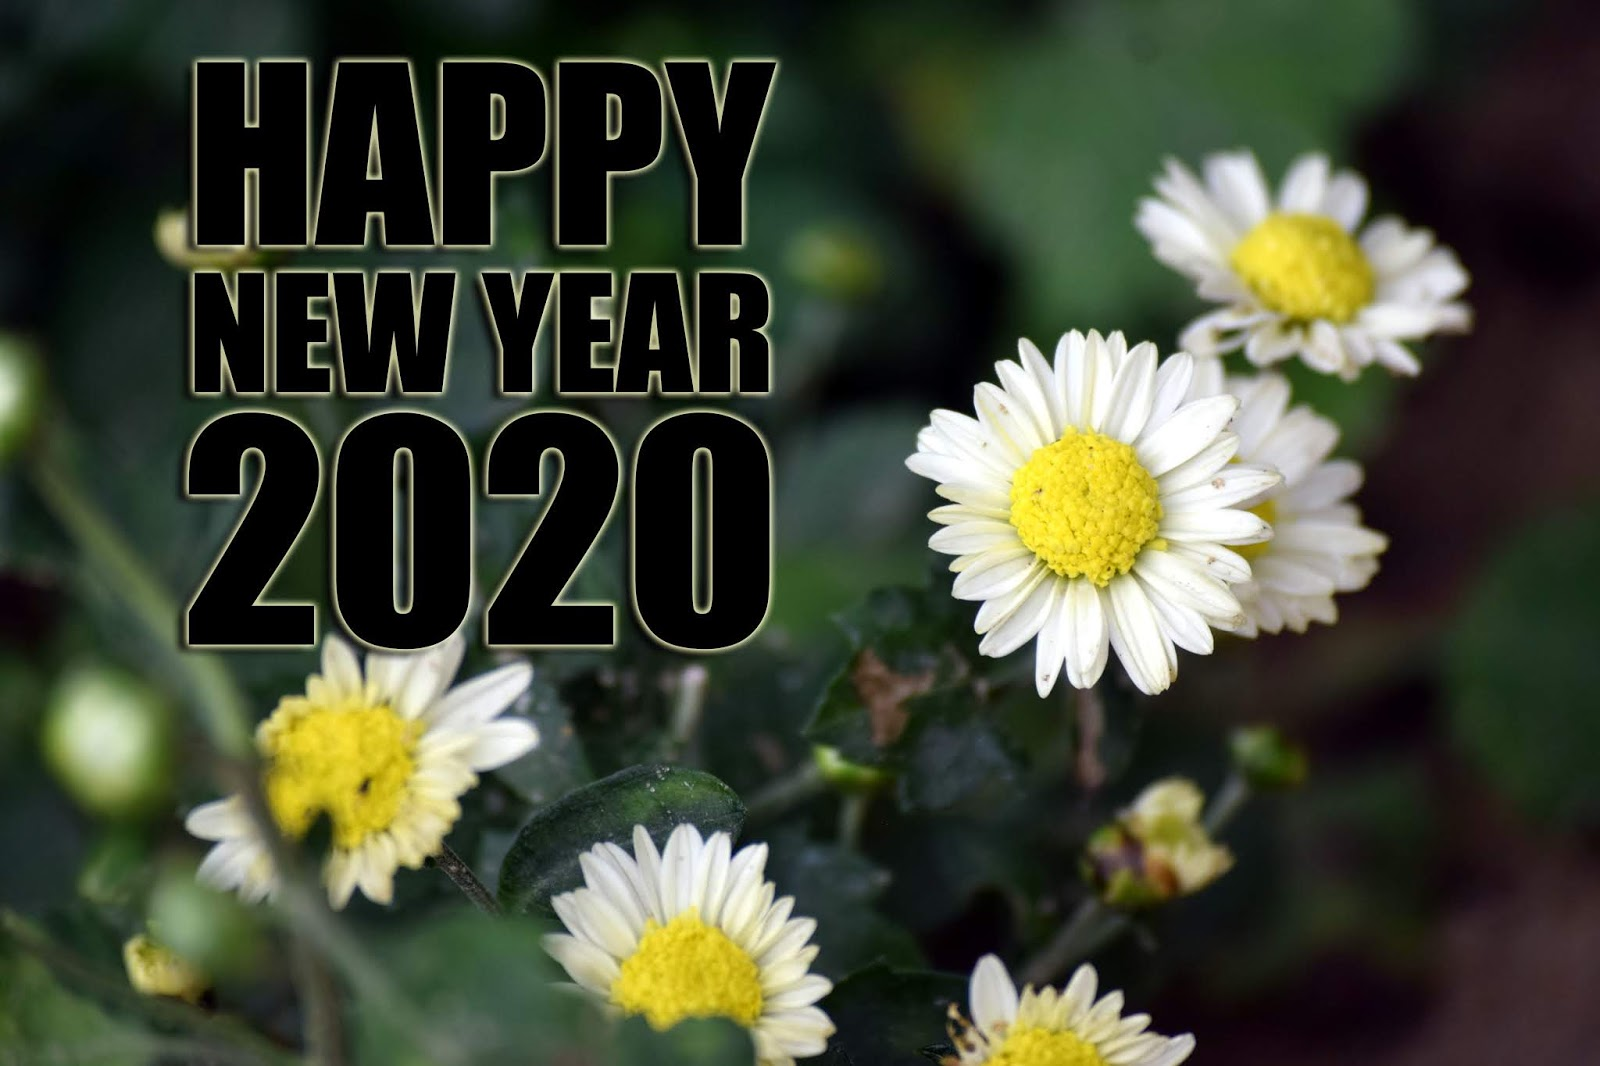 happy new year 2020 4k image, wishes, greeting, photo